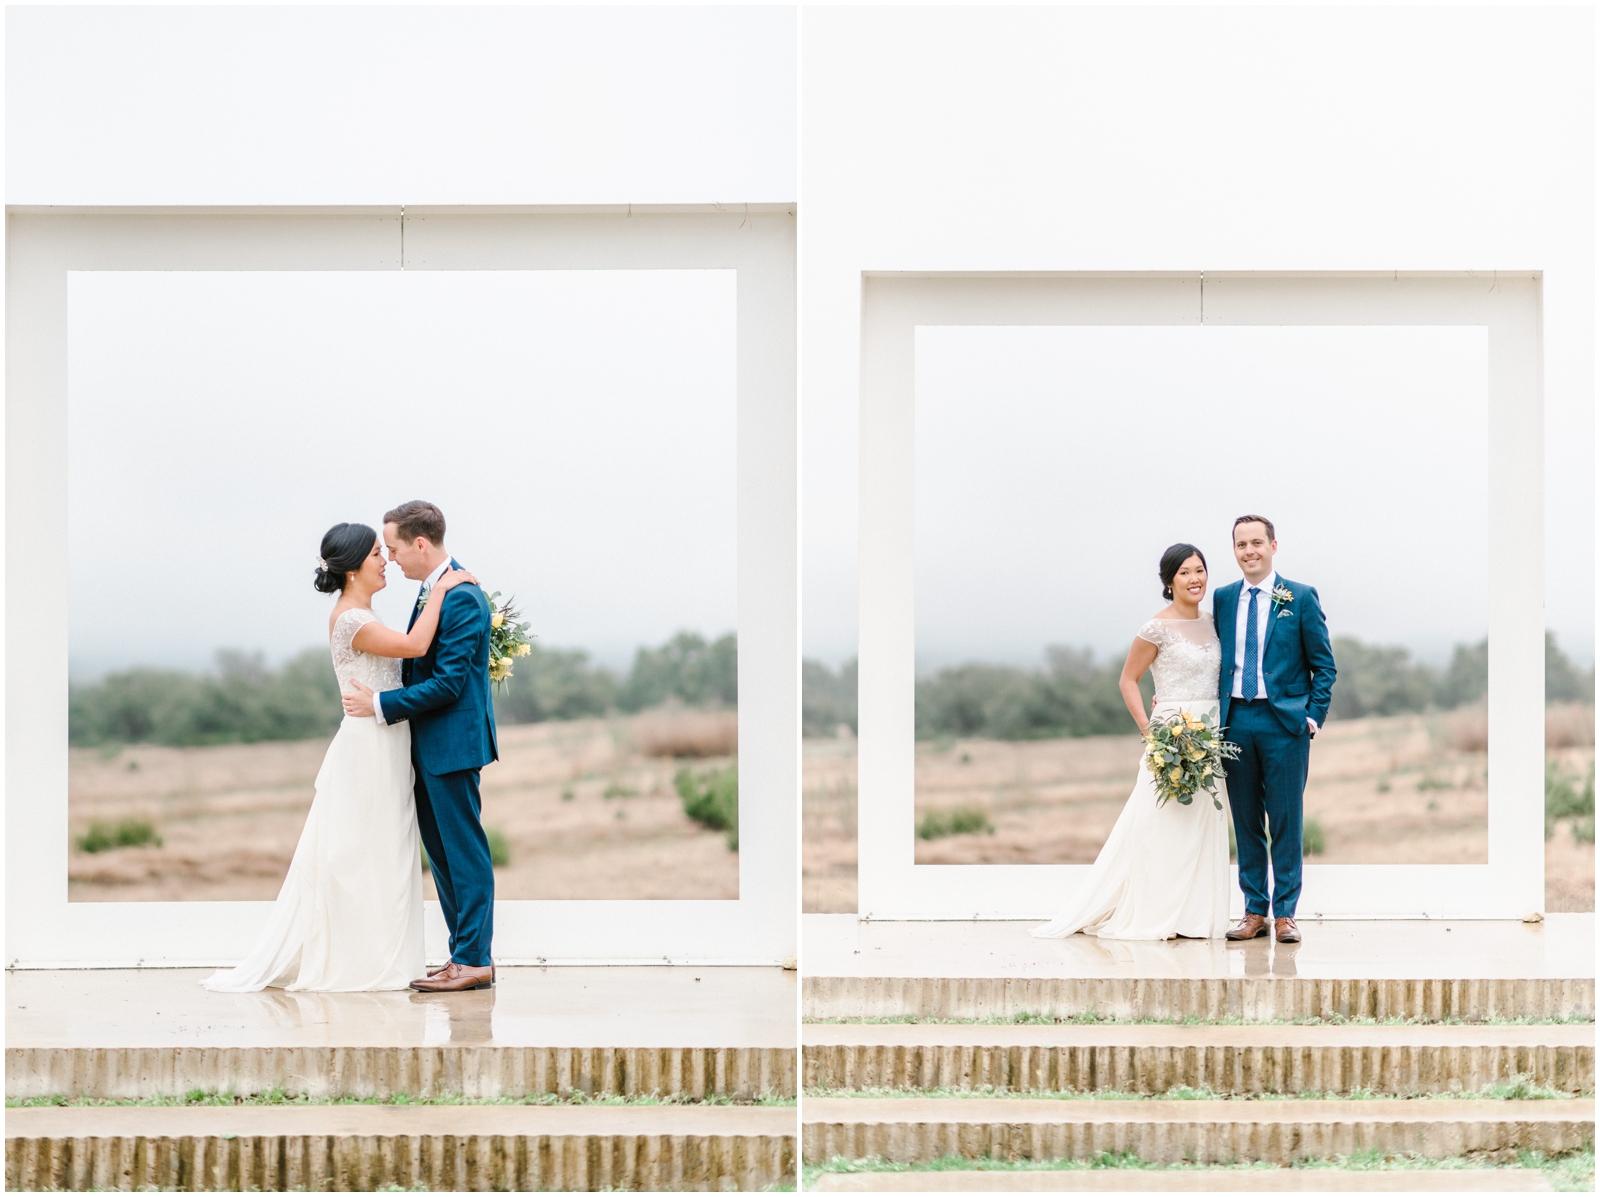 Minimalistic TX Venue Prosper House -Austin Wedding Planner_0346.jpg